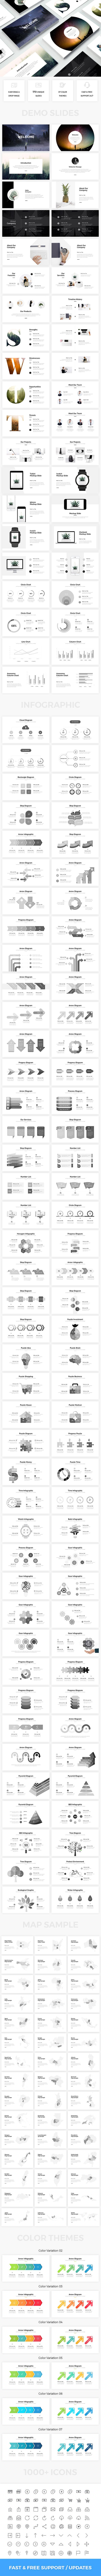 Corporate Google Slides Template - Google Slides Presentation Templates